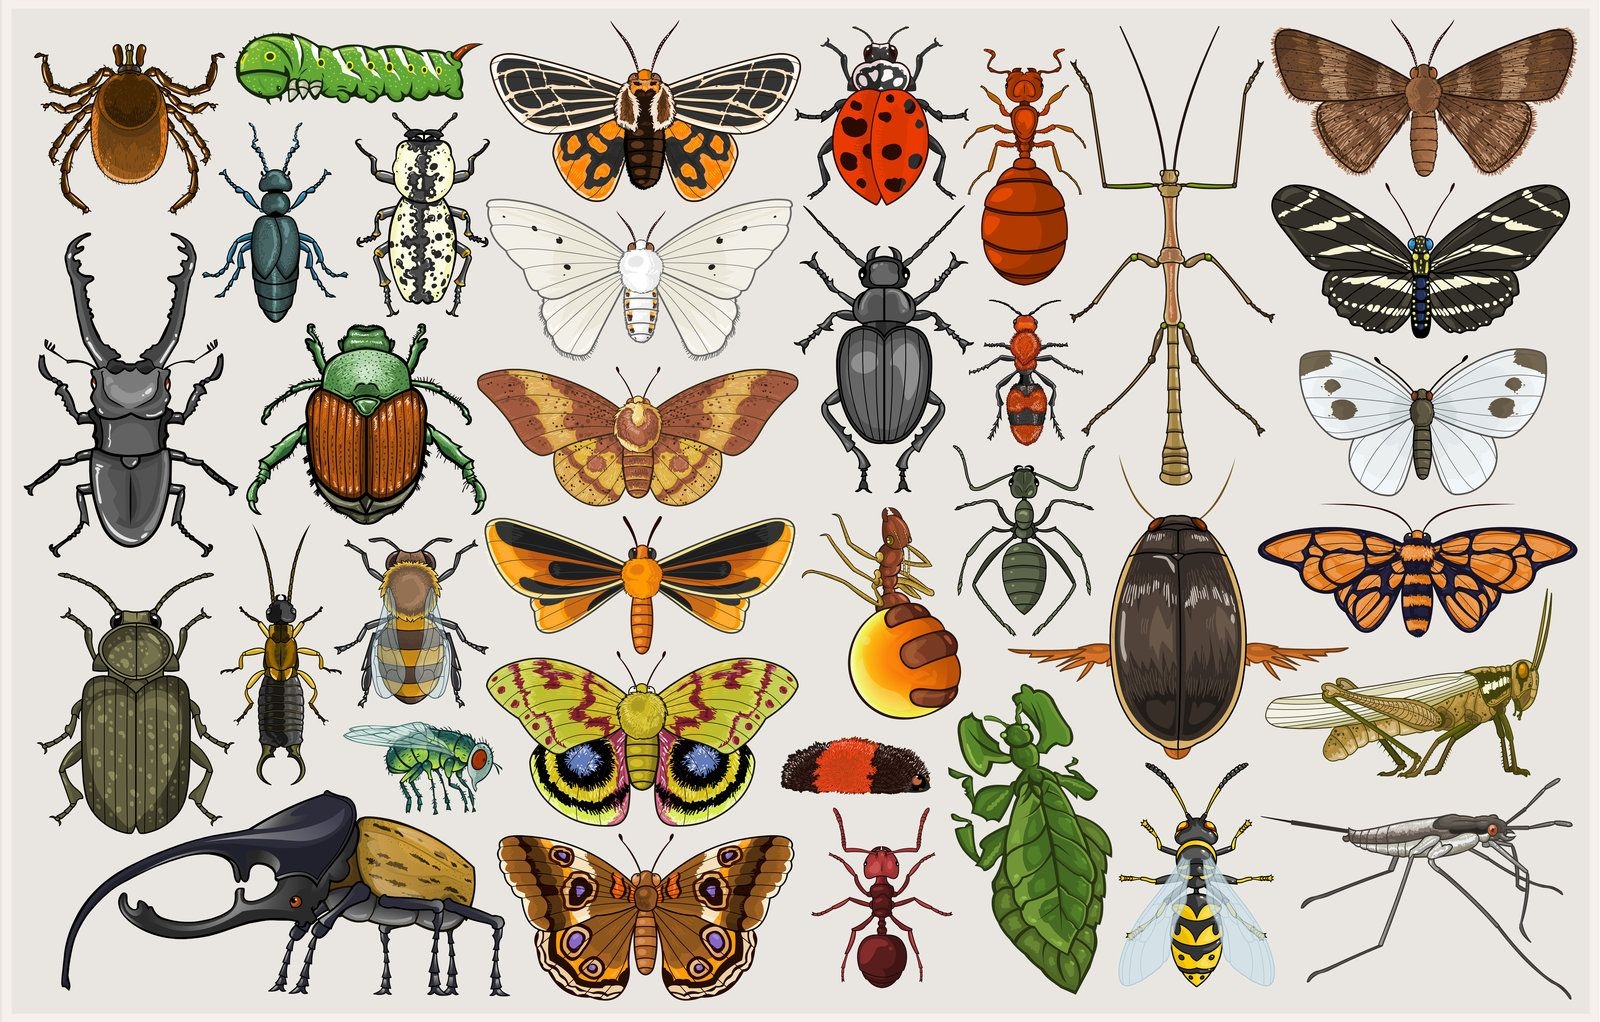 энтомология в картинках тому техника